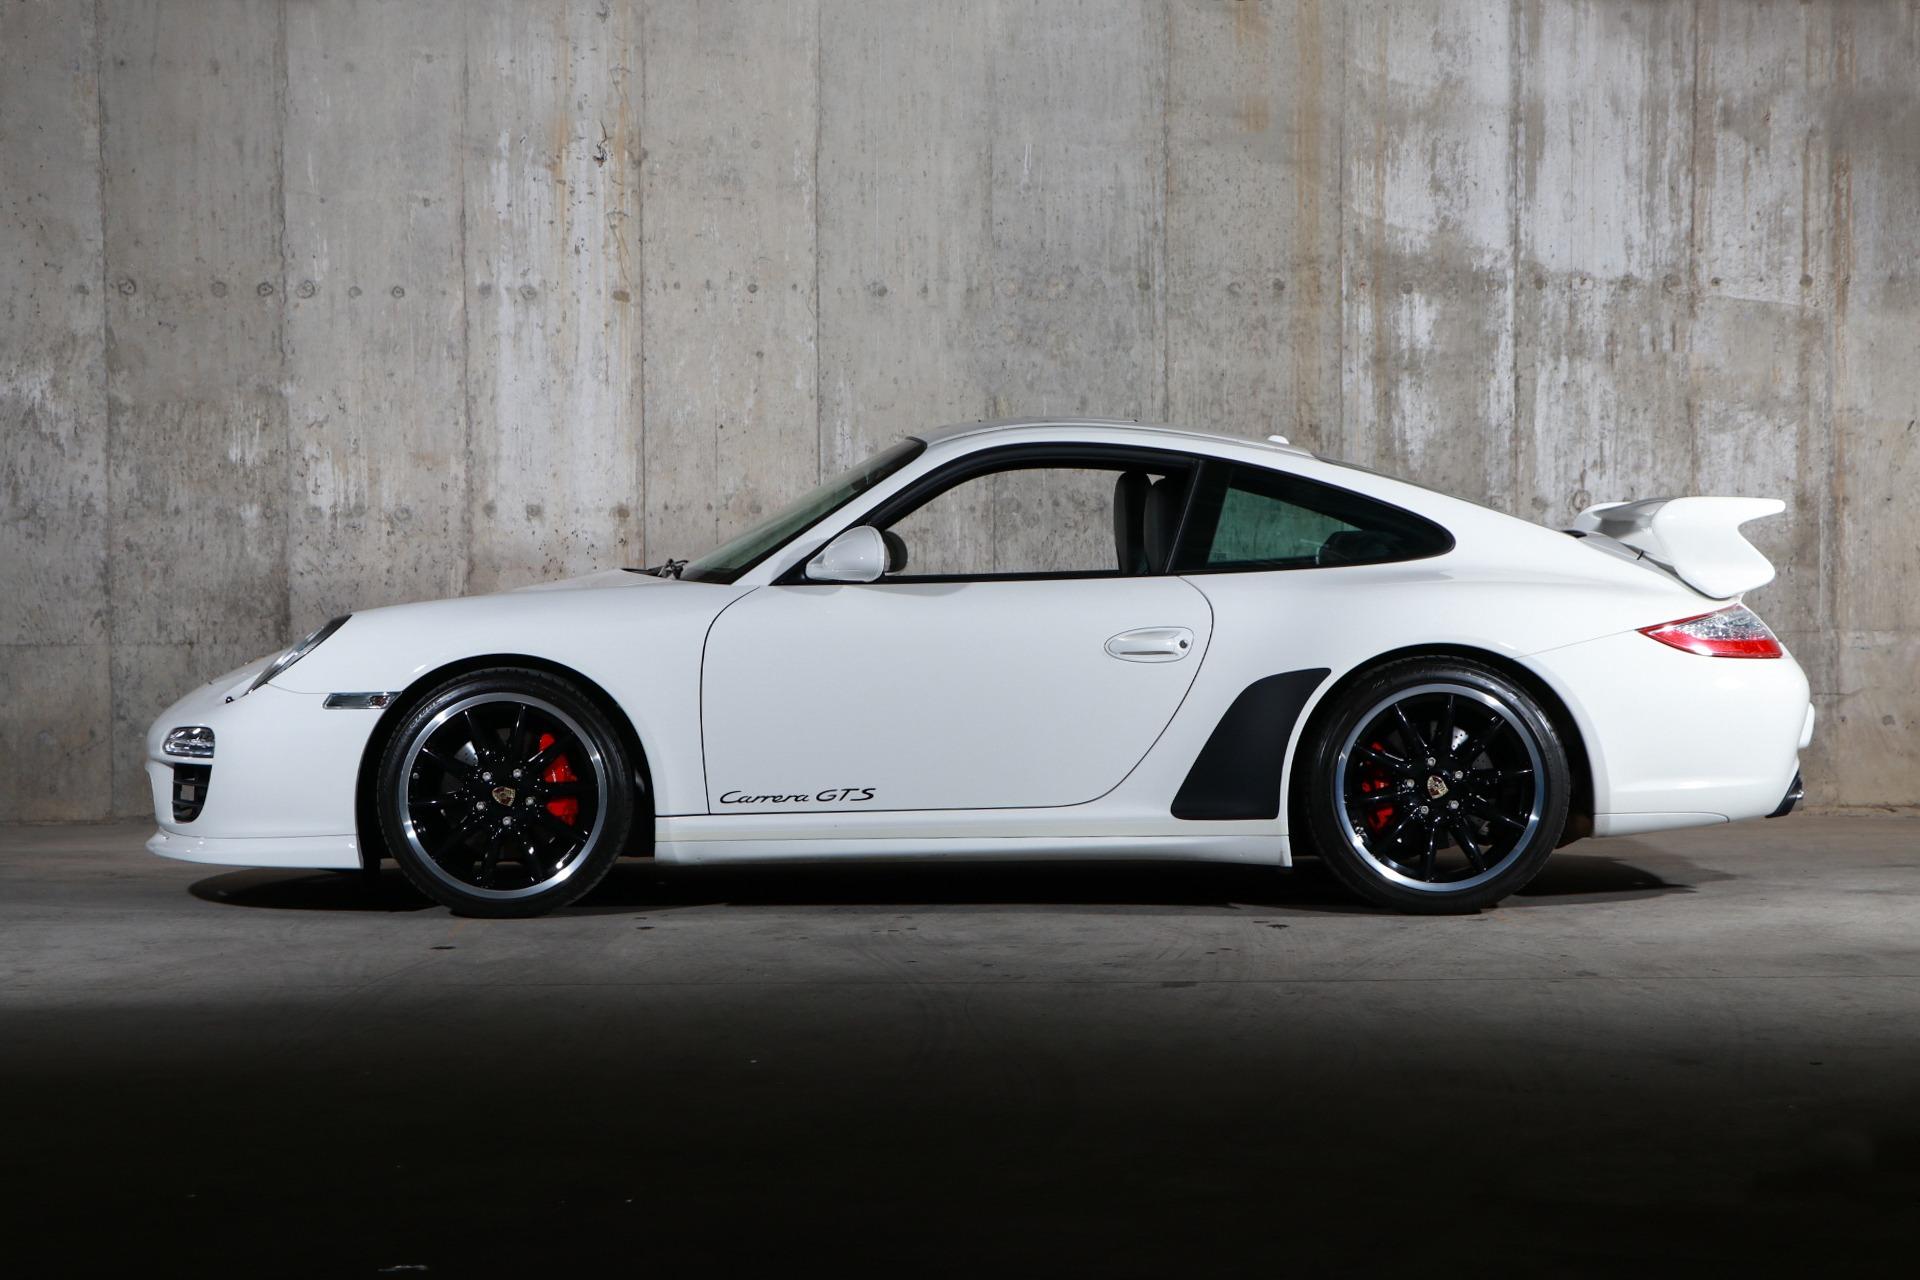 Porsche 997.2 Carrera GTS